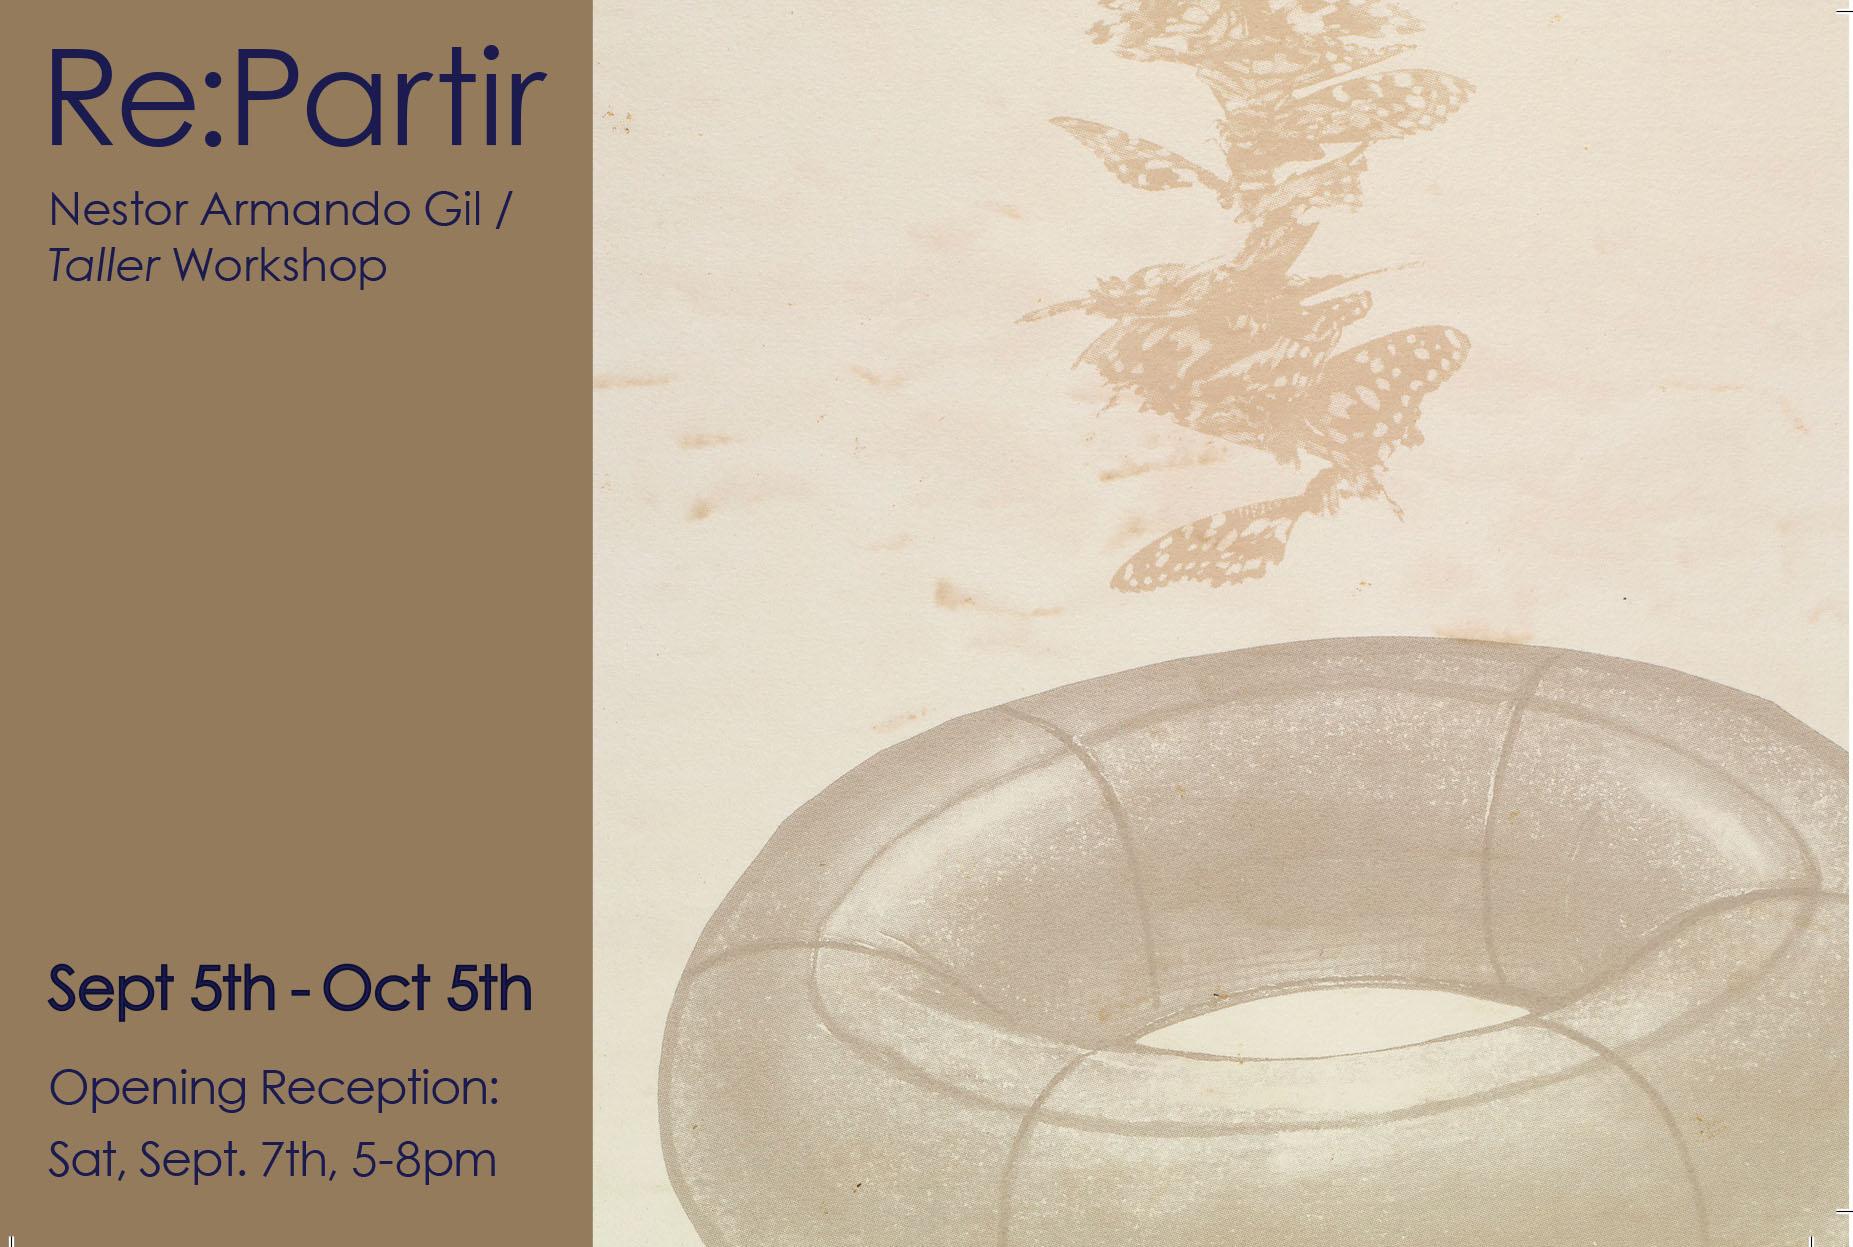 Nestor Armando Gil - Taller WorkshopOpening Reception: Saturday, September 7th 5-8pm